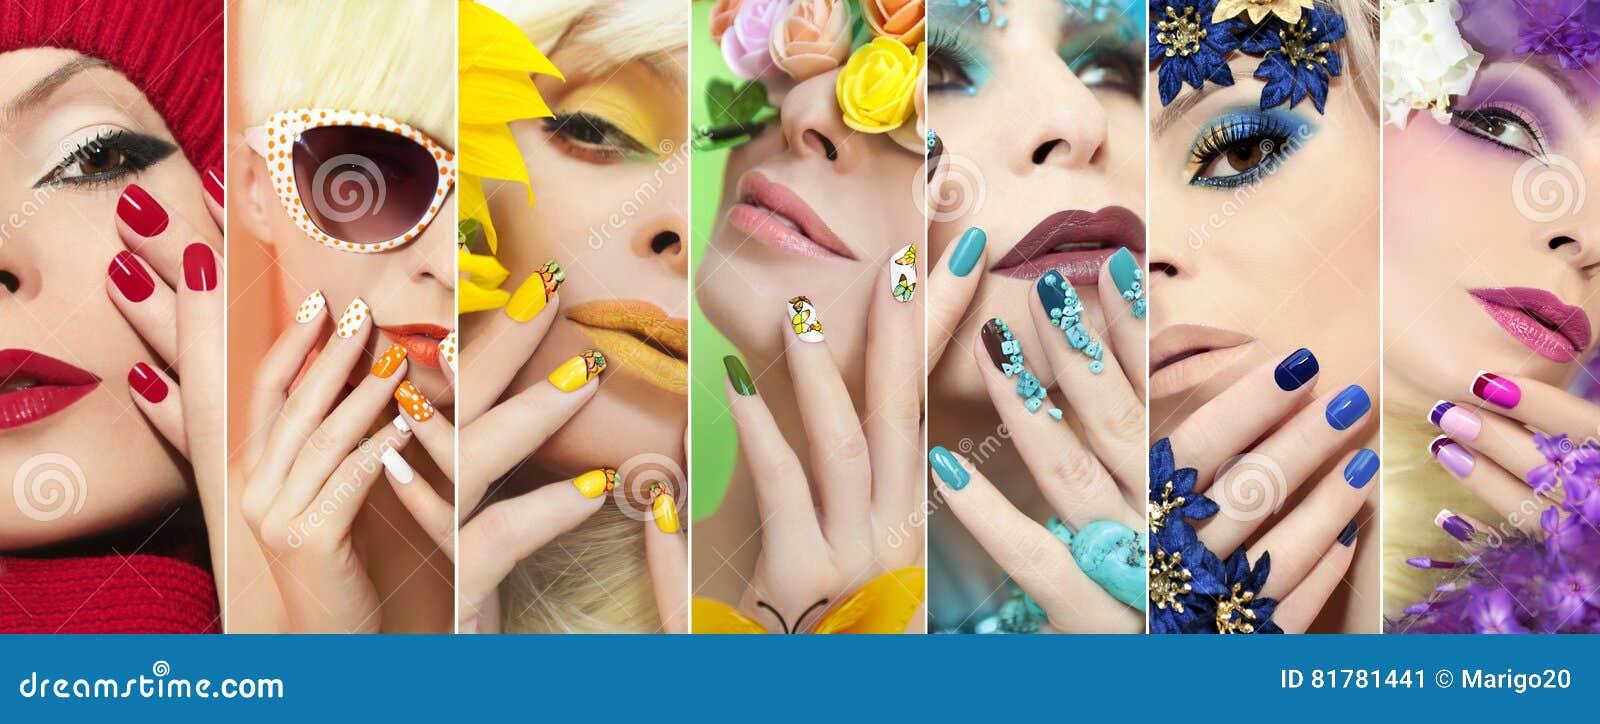 Żółty makeup i Francuski manicure